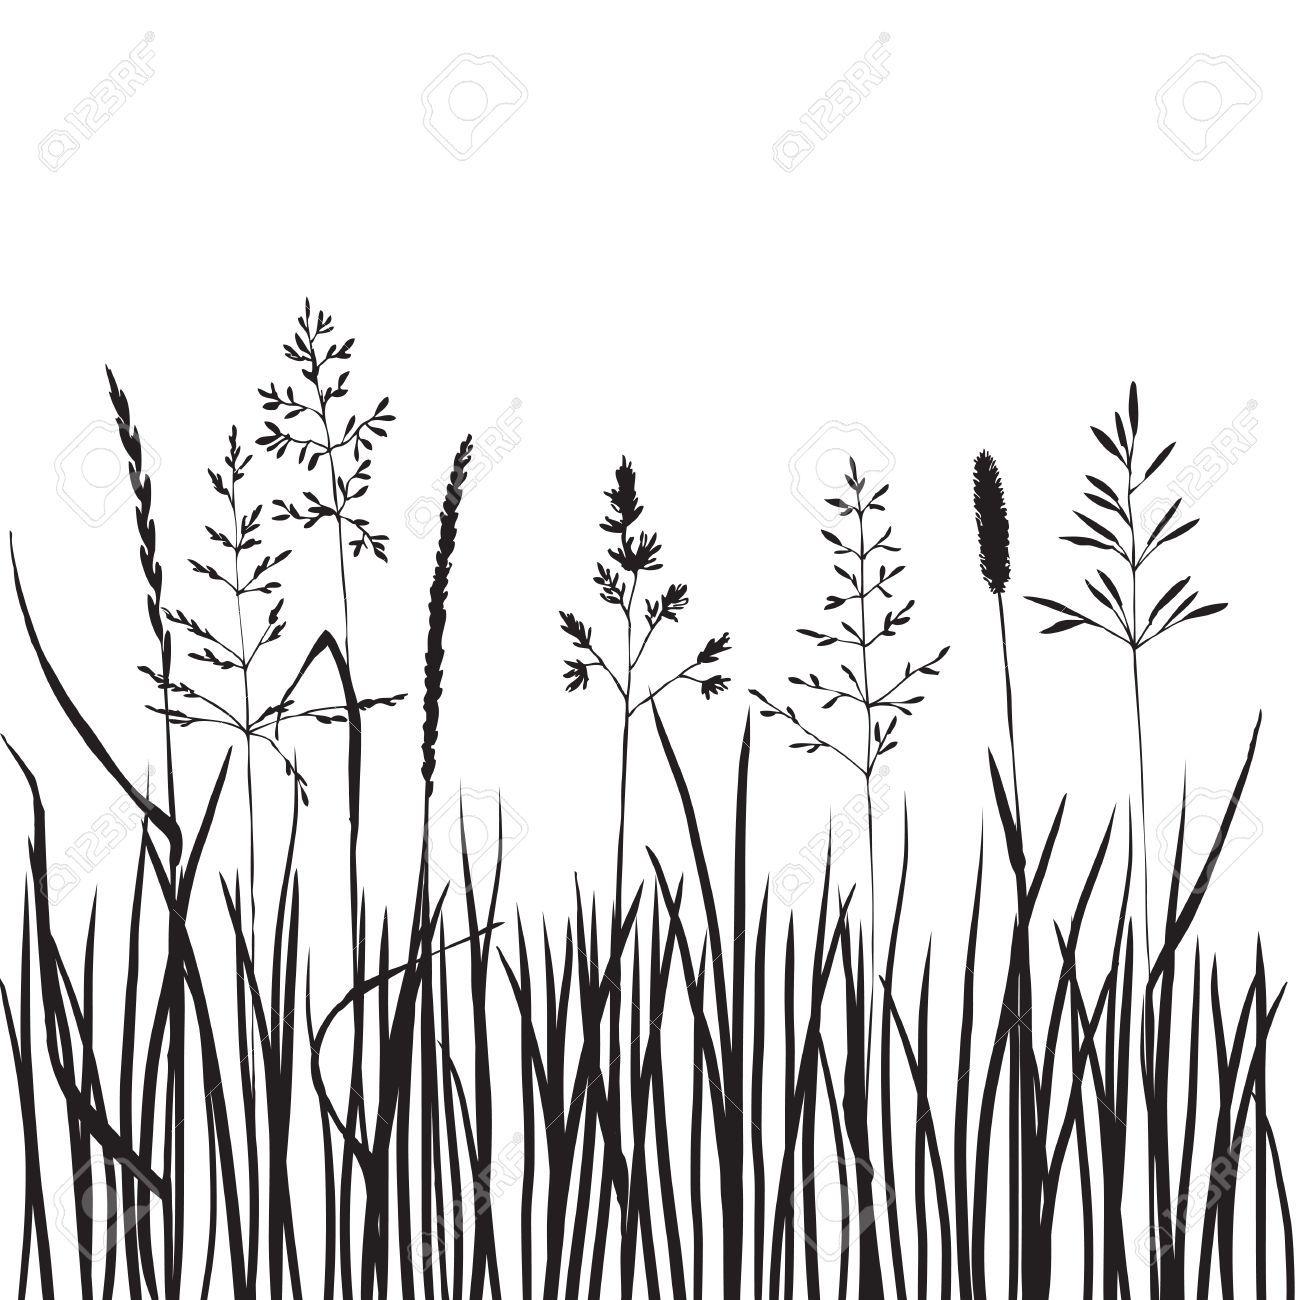 41957164 Black Grass Silhouettes Hand Drawn Wild Cereals